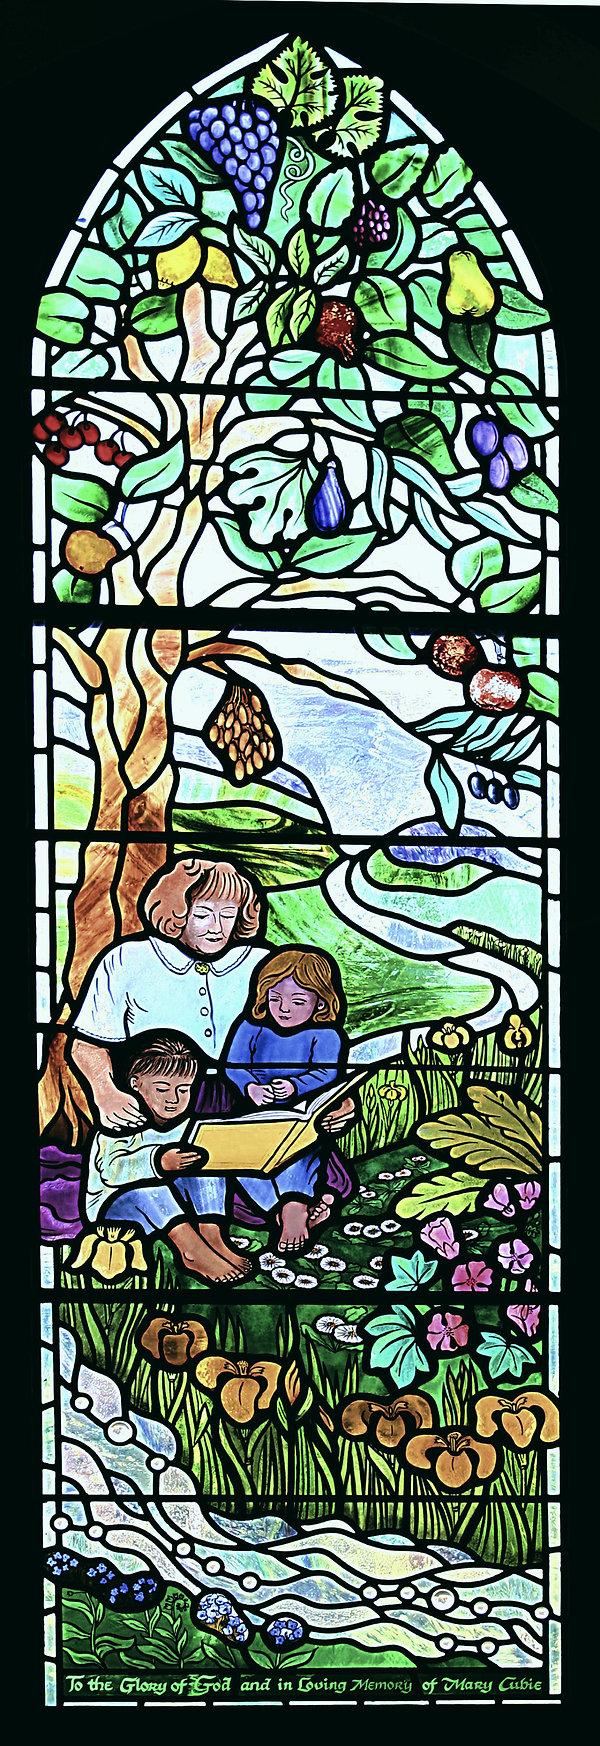 Mary Cubie Alloway Parish Church Teacher Revelation Ephesians Tree of Life Water of Life Fruit Ayrshire Holy Land Susan Bradbury Stained Glas Window